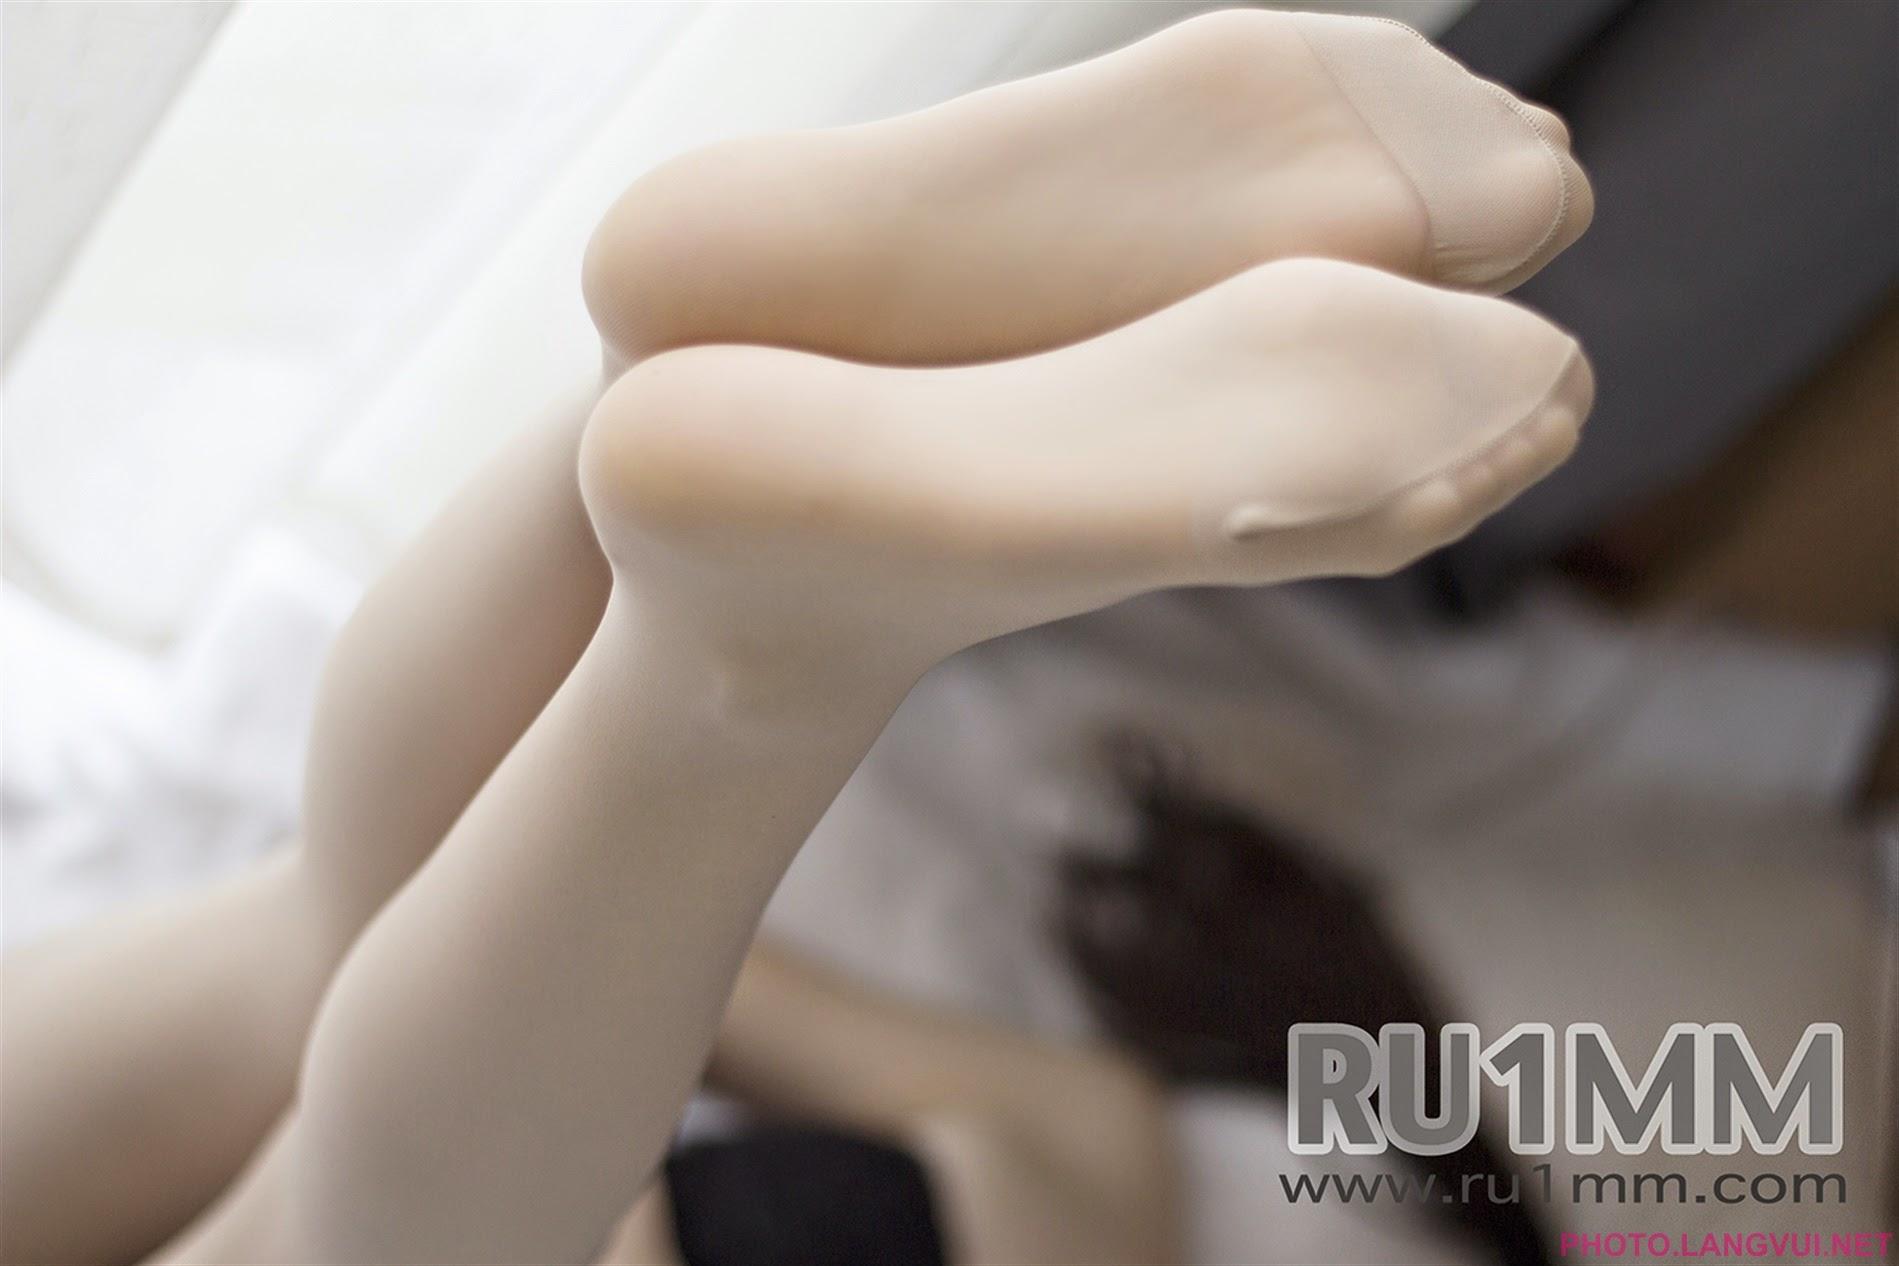 RU1MM No 037